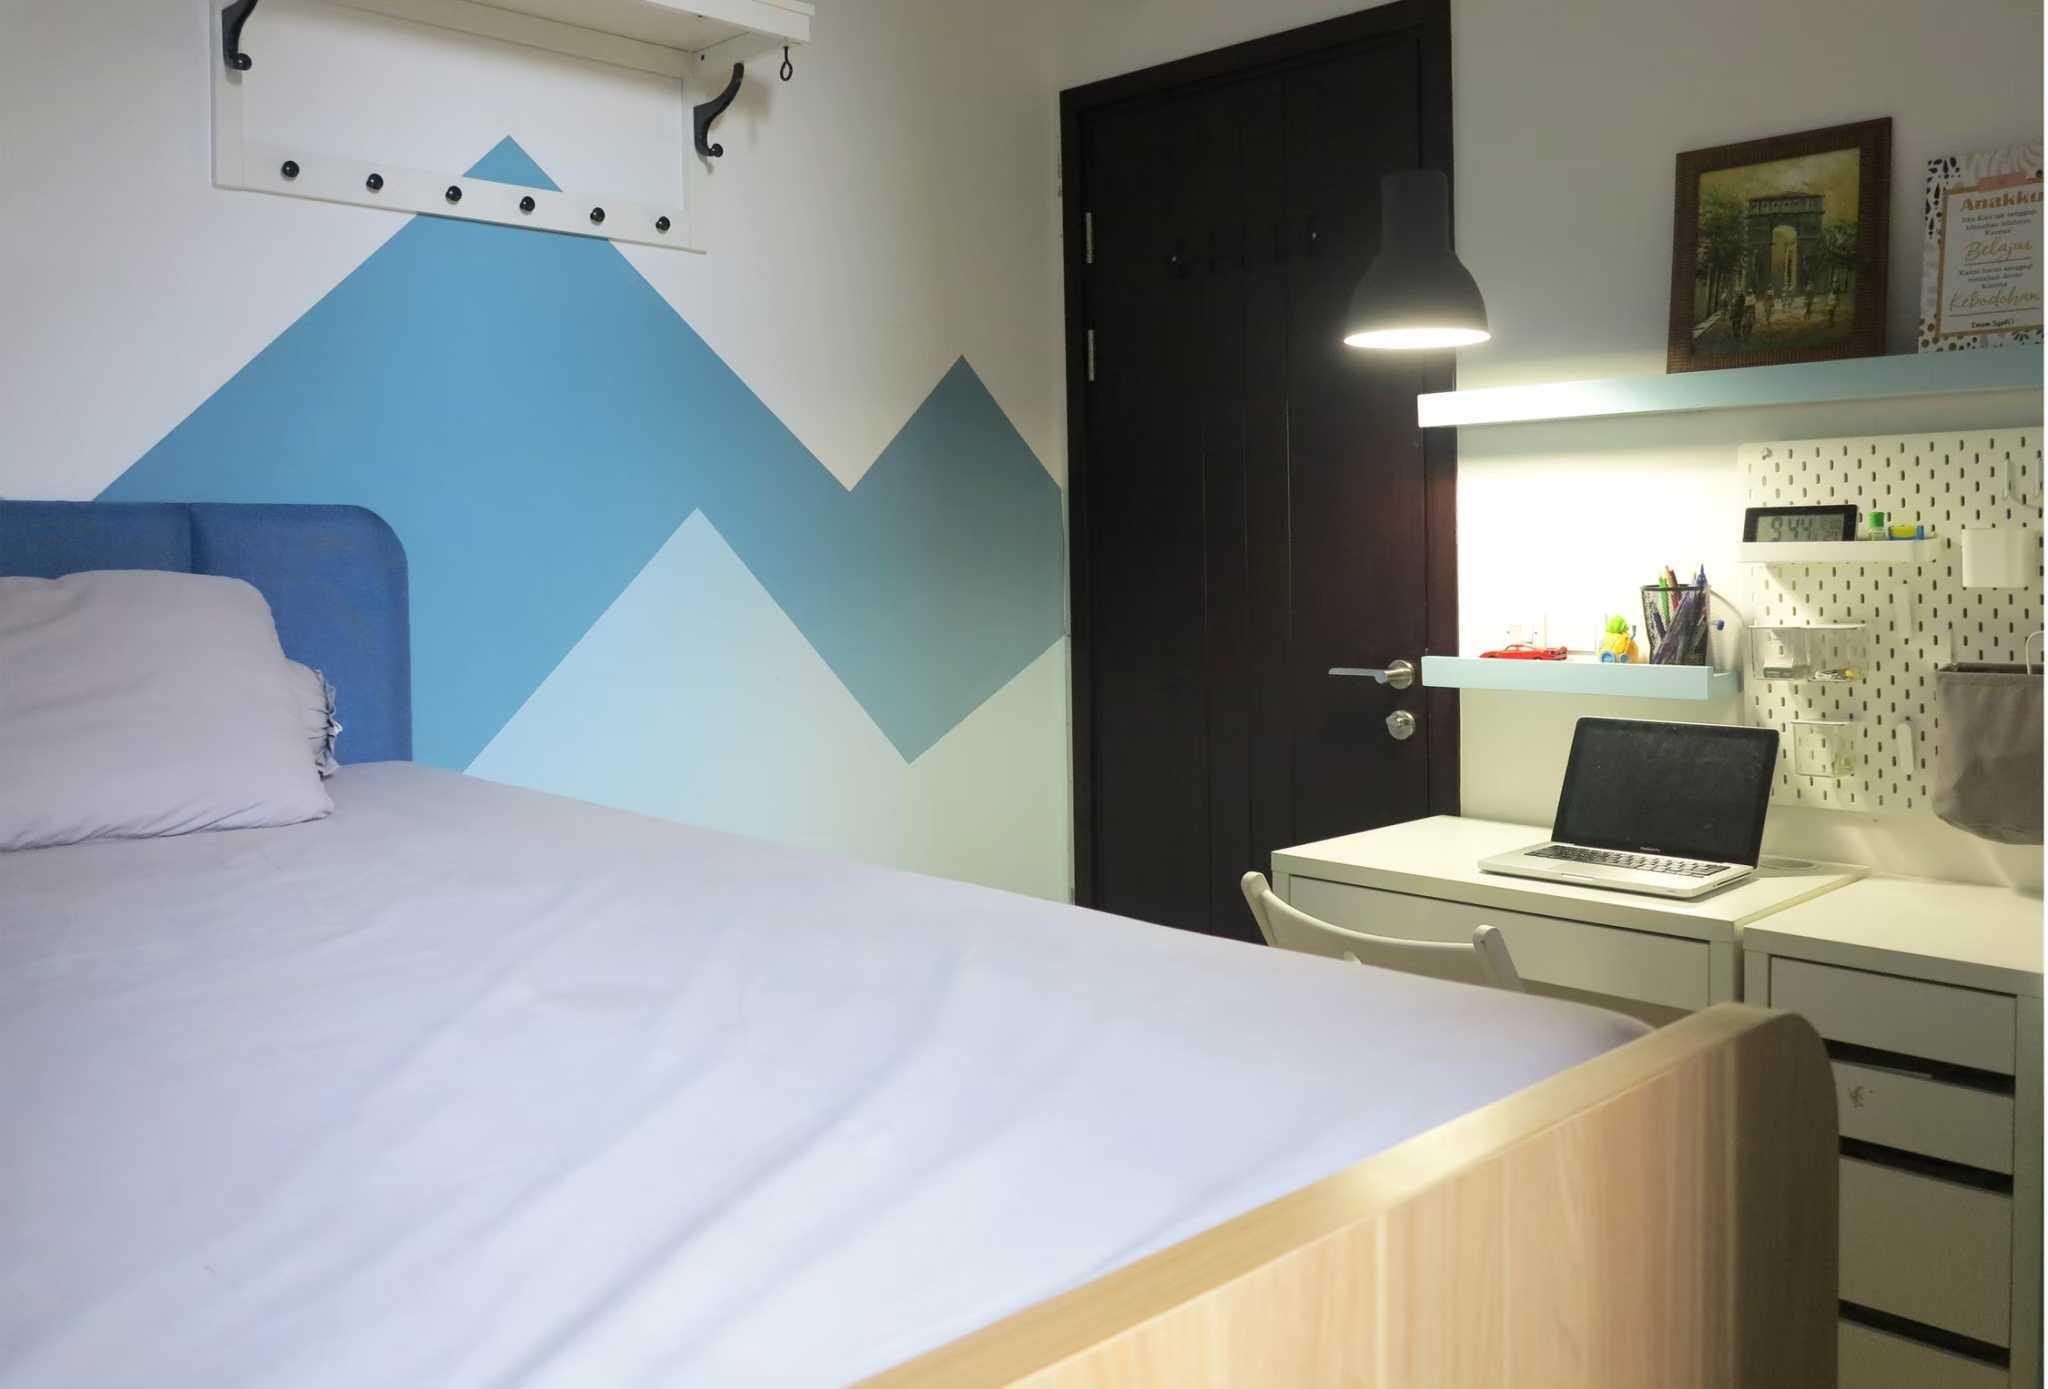 9596 Design Studio Bsd Kids Bedroom Lengkong Kulon, Kec. Pagedangan, Tangerang, Banten 15331, Indonesia Sinar Mas Land Plaza Jl. Grand Boulevard Bsd City, Sampora, Kec. Cisauk, Tangerang, Banten 15345, Indonesia 9596-Design-Studio-Bsd-Kids-Bedroom  122553